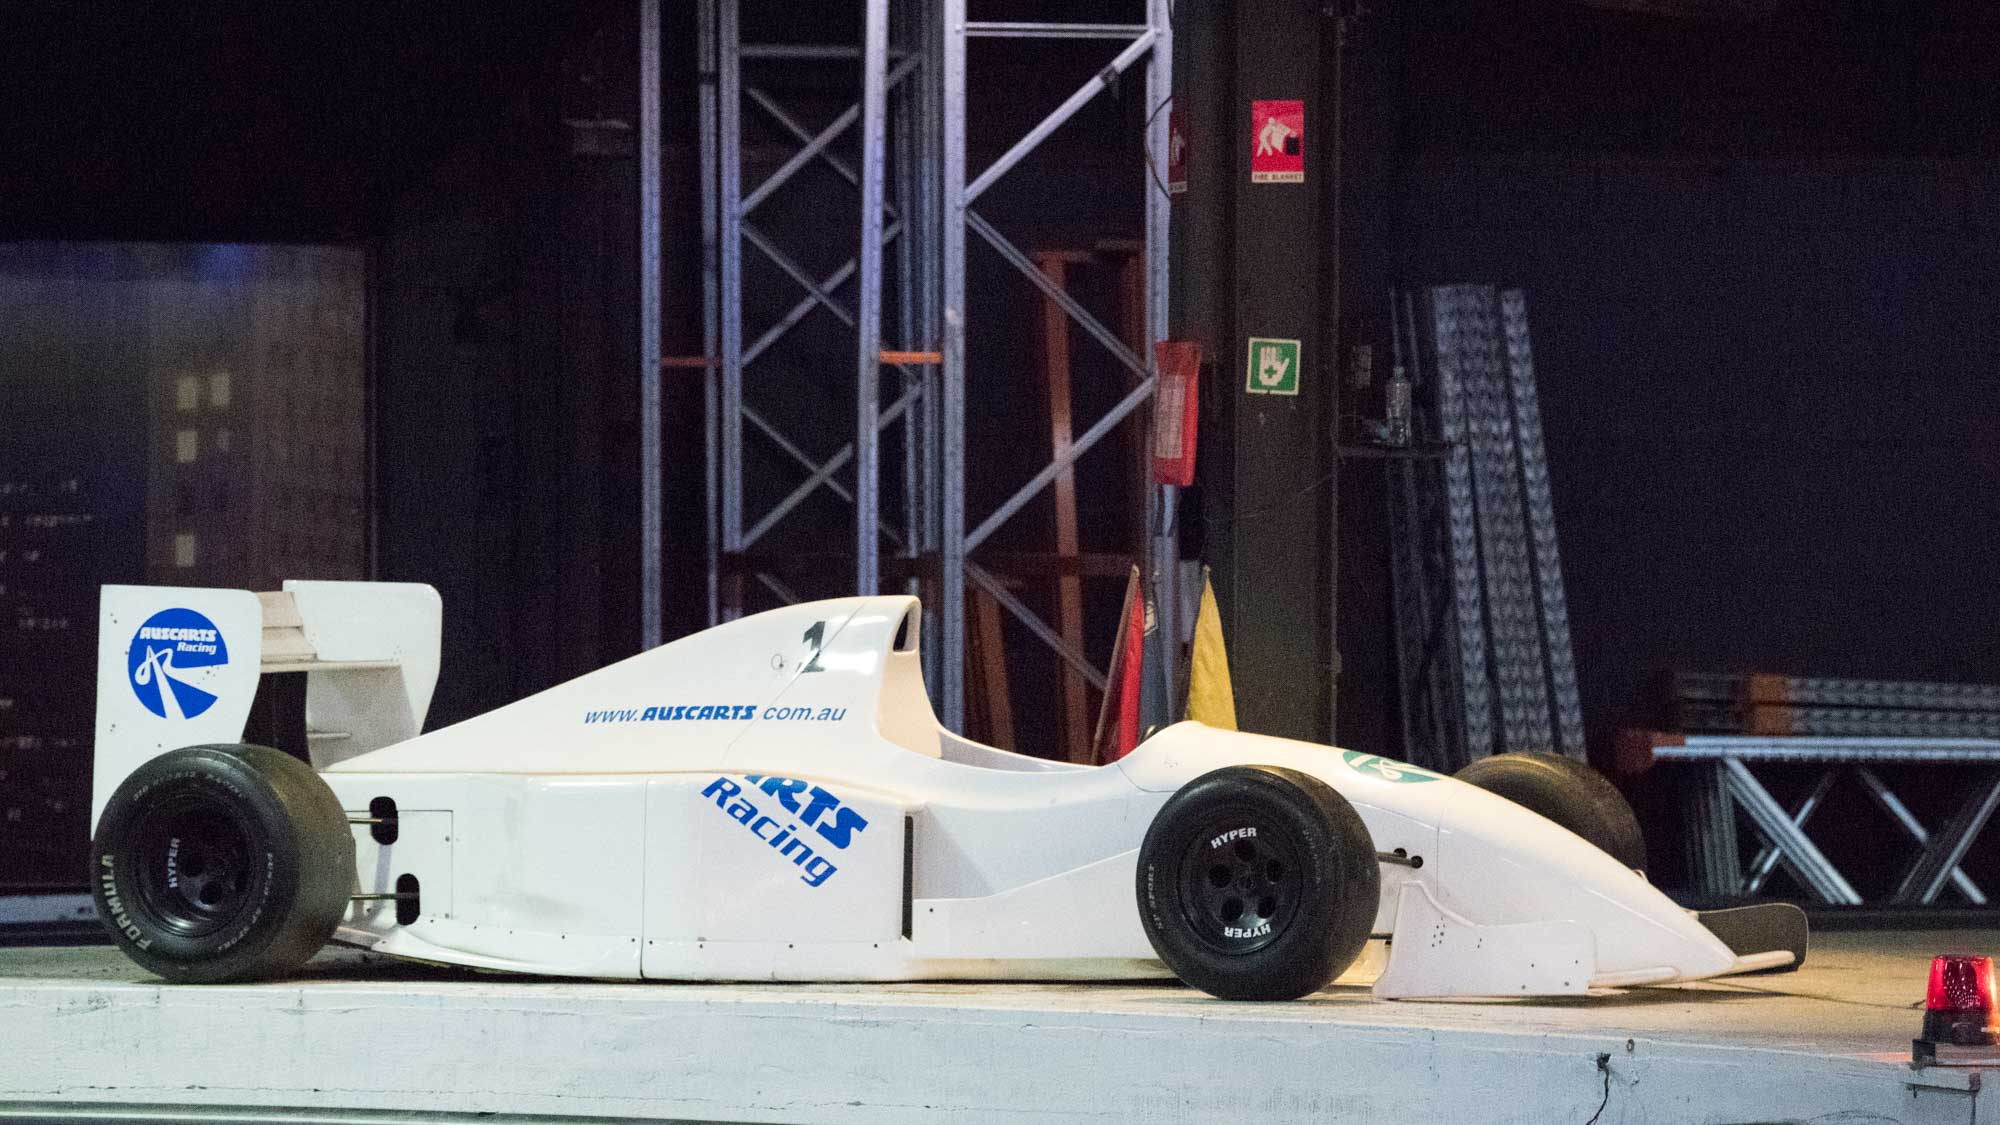 Formula 1 car on a platform. Nikon D5 camera.